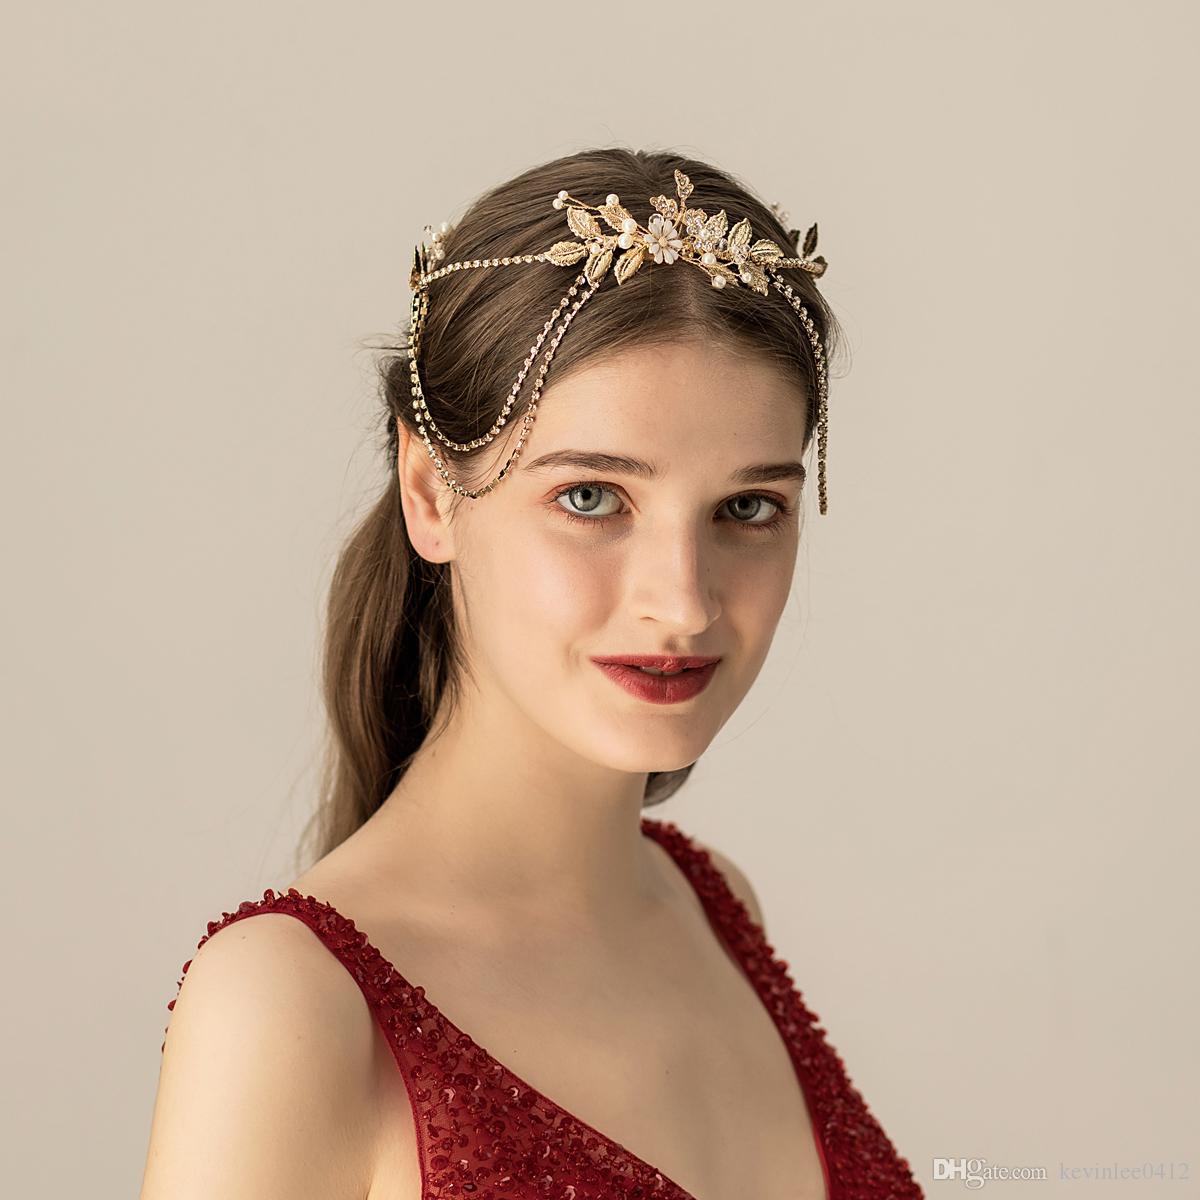 https://www.dhresource.com/0x0s/f2-albu-g10-M01-9D-C7-rBVaWV0EhnmAd46iAAvjVulKtOs223.jpg/vintage-gold-rhinestone-flower-chain-headpiece-wedding-hair-accessories-special-occasion-headbands-bridal-tiara-crown-chinese-headband.jpg